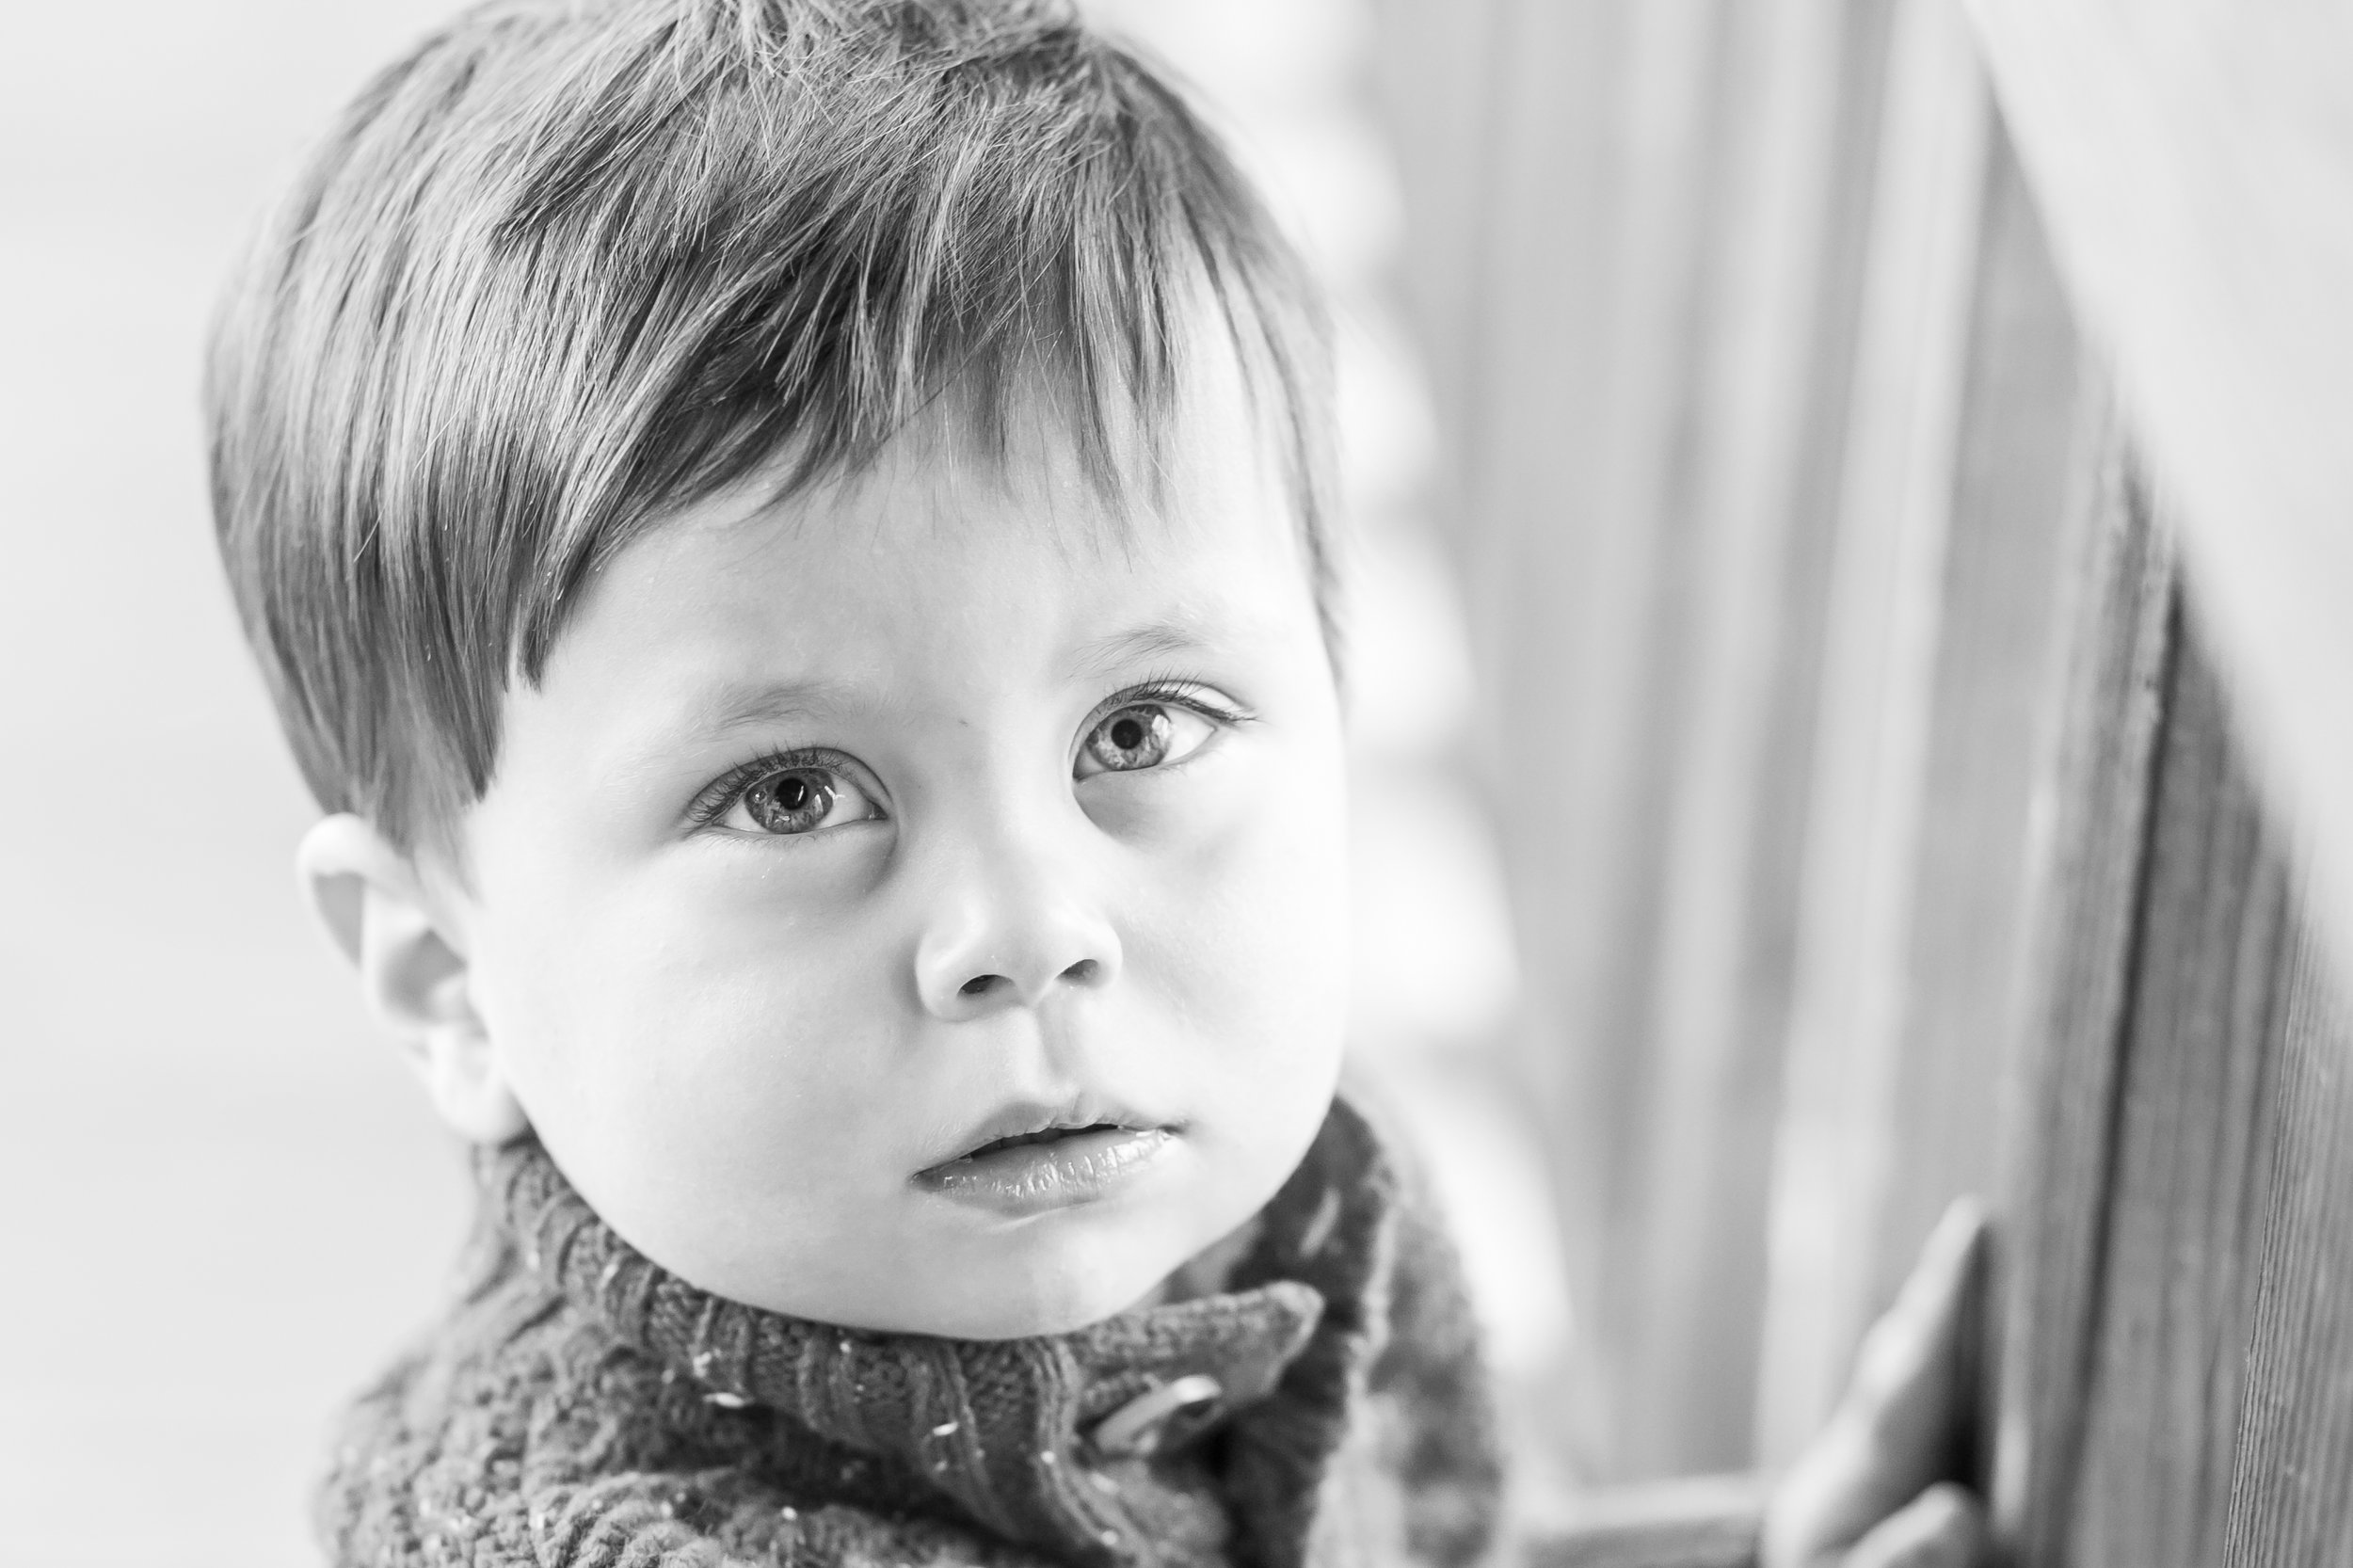 JJ-Ignotz-NYC-Photographer-Kids+Family_007.JPG